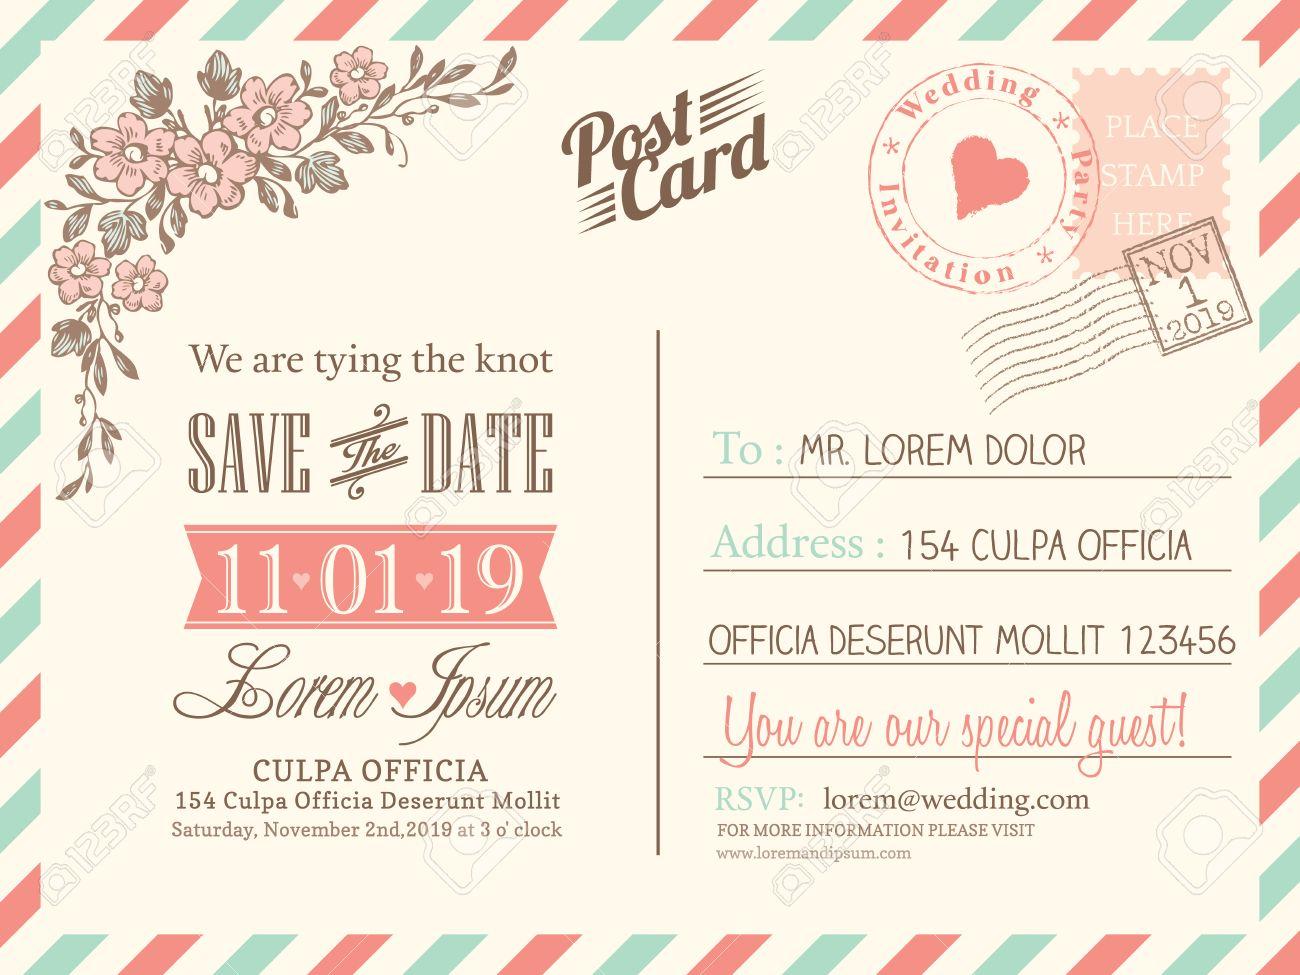 Vintage Postcard Background Vector Template For Wedding Invitation ...